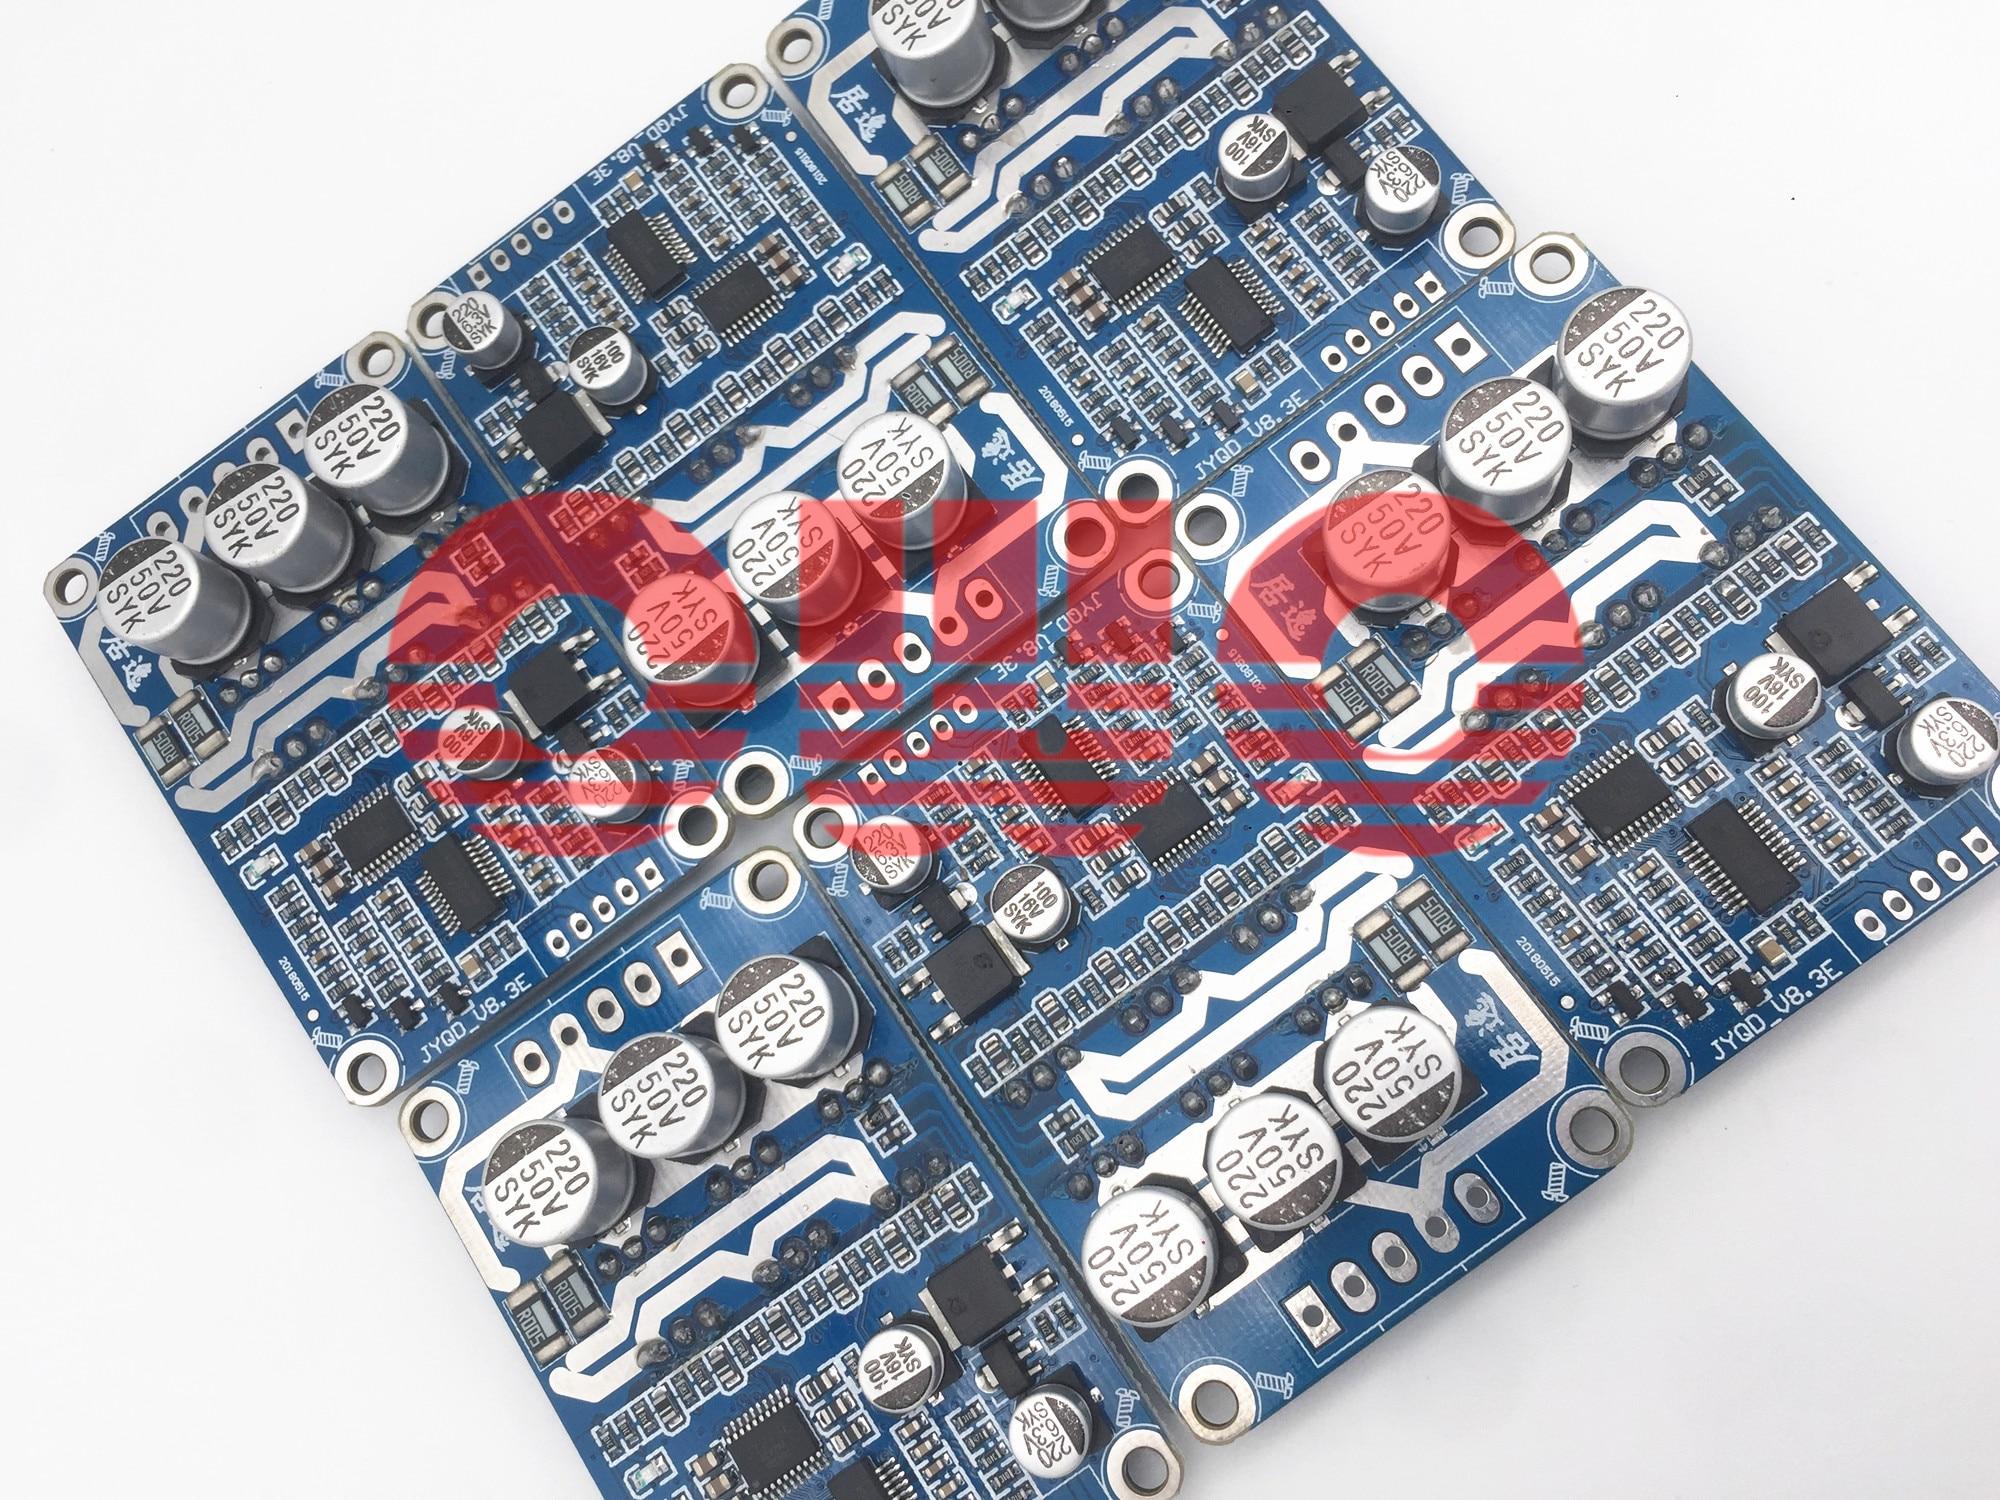 6 pieces Original JUYI Tech JYQD-V8.3E bldc motor driver board for sensorless brushless DC motor